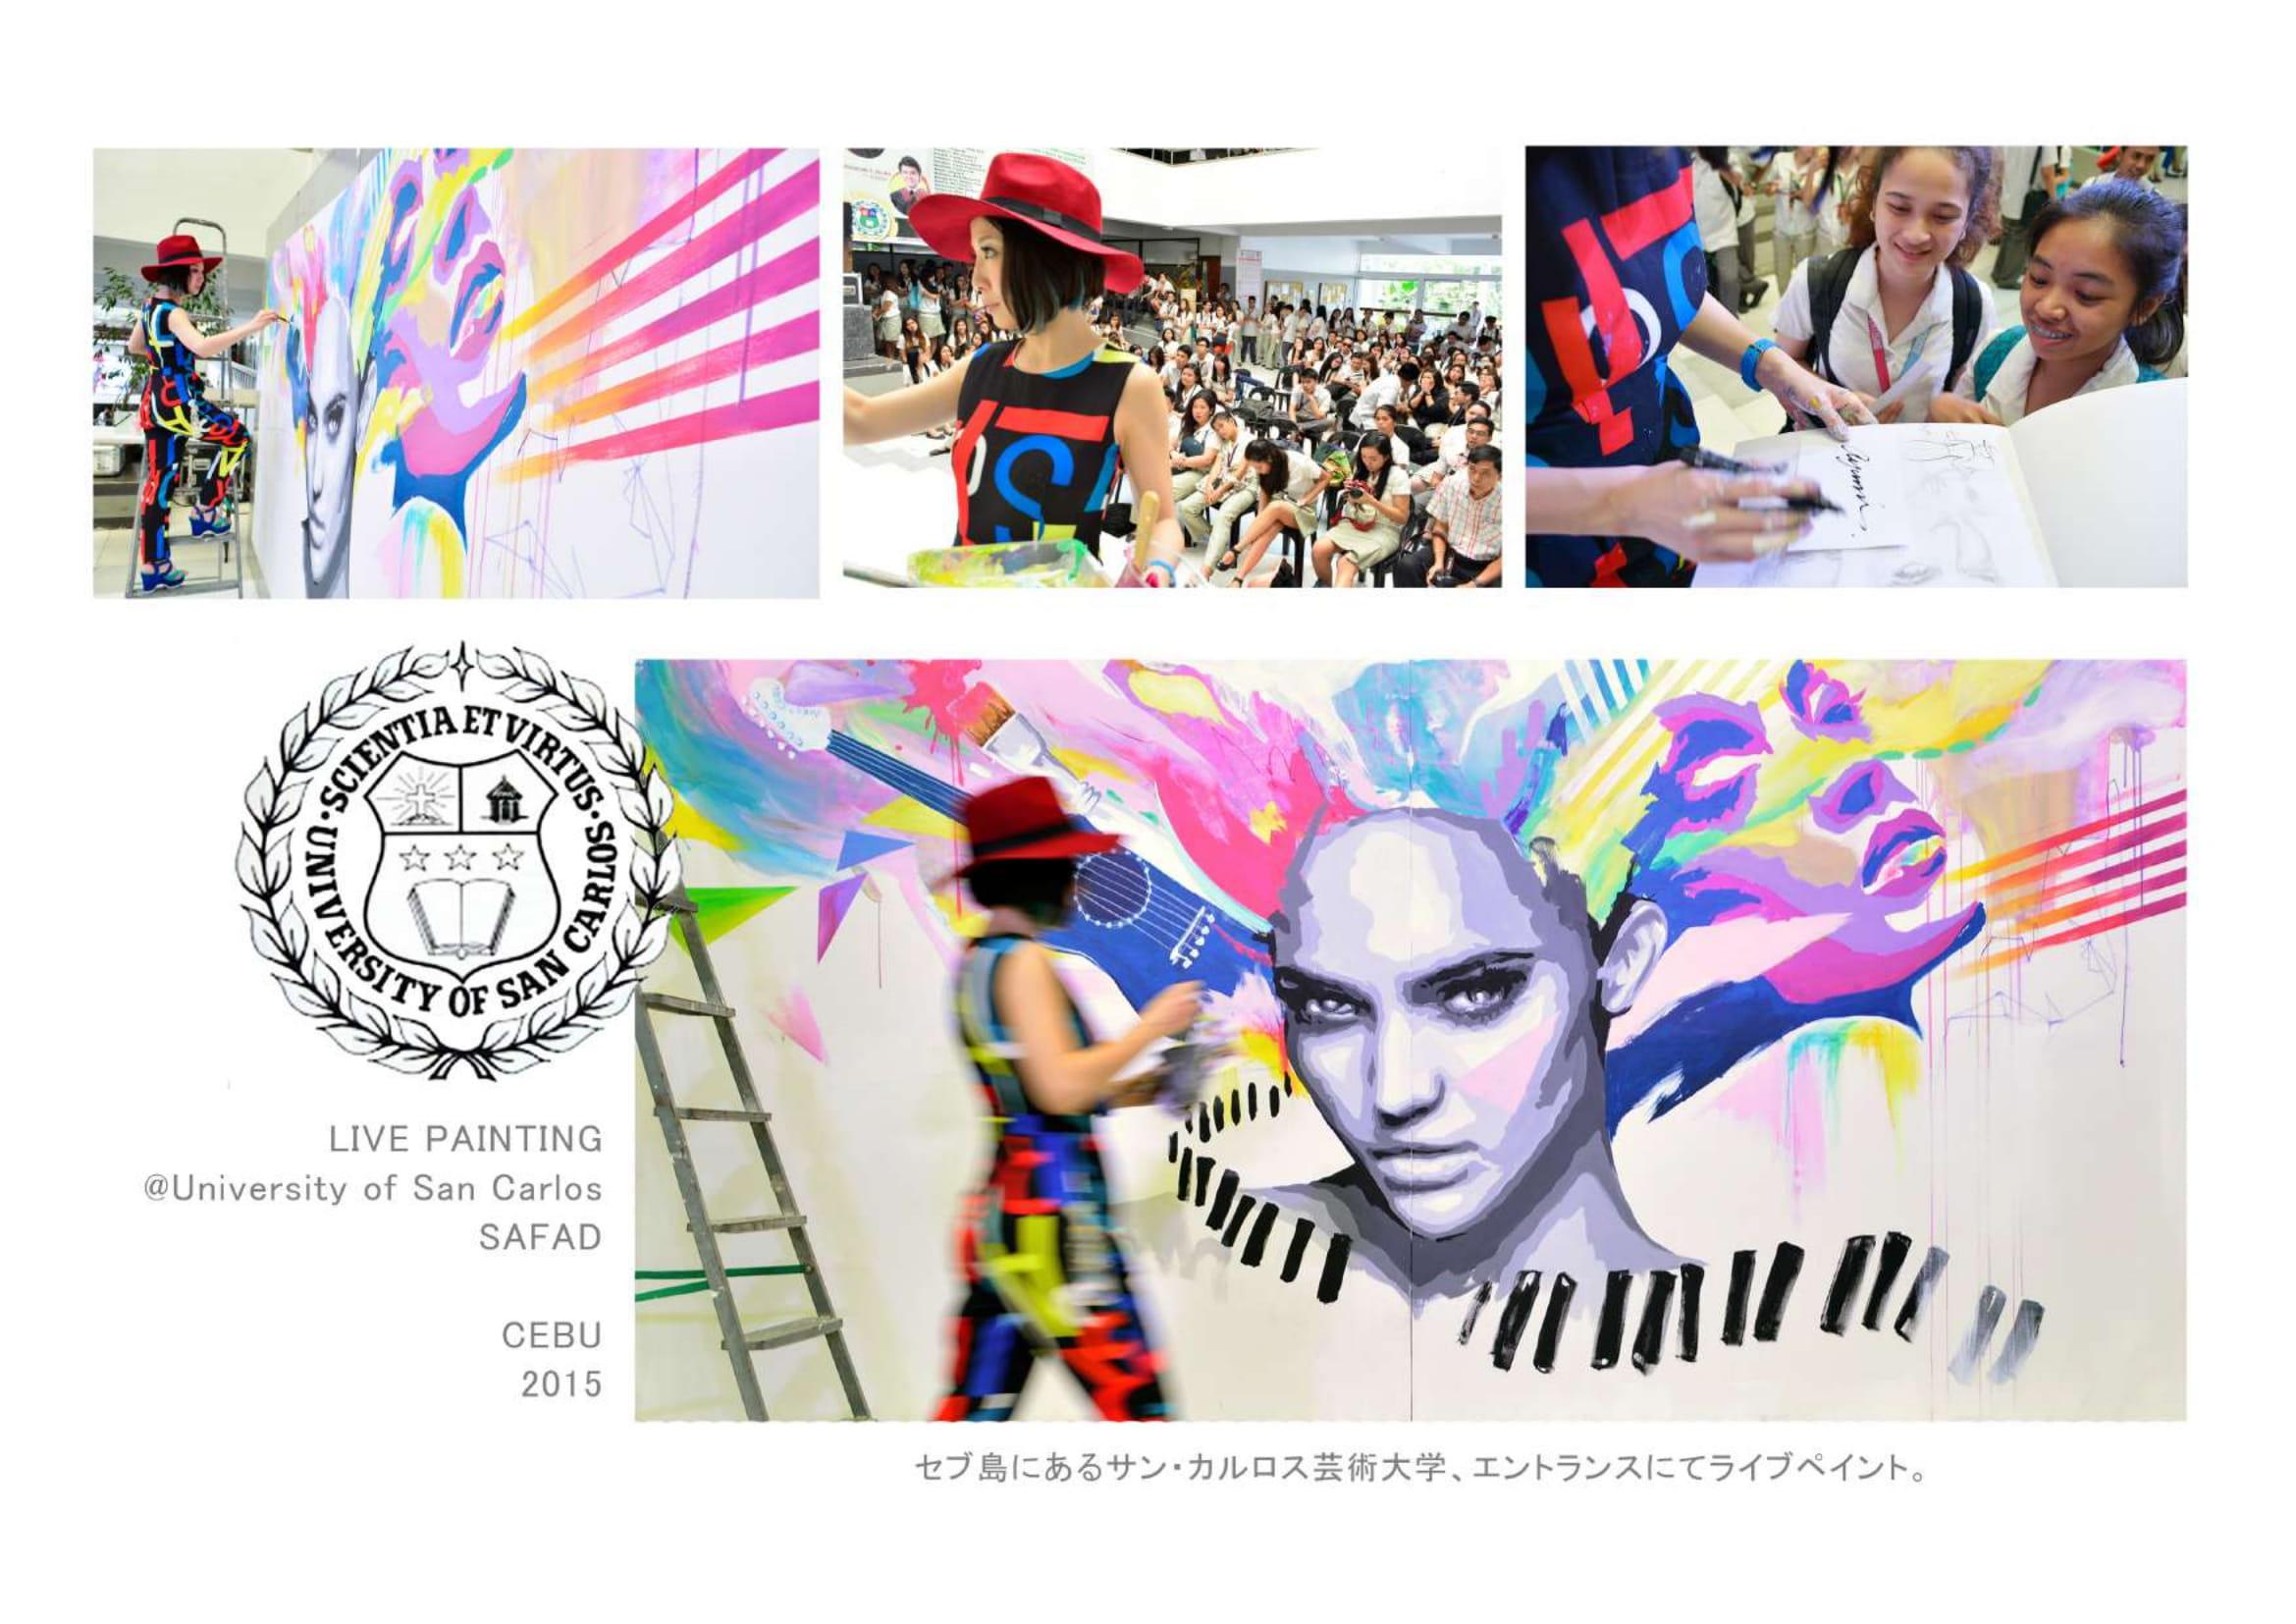 AYUMI_Artworks_Jp_S-20-1